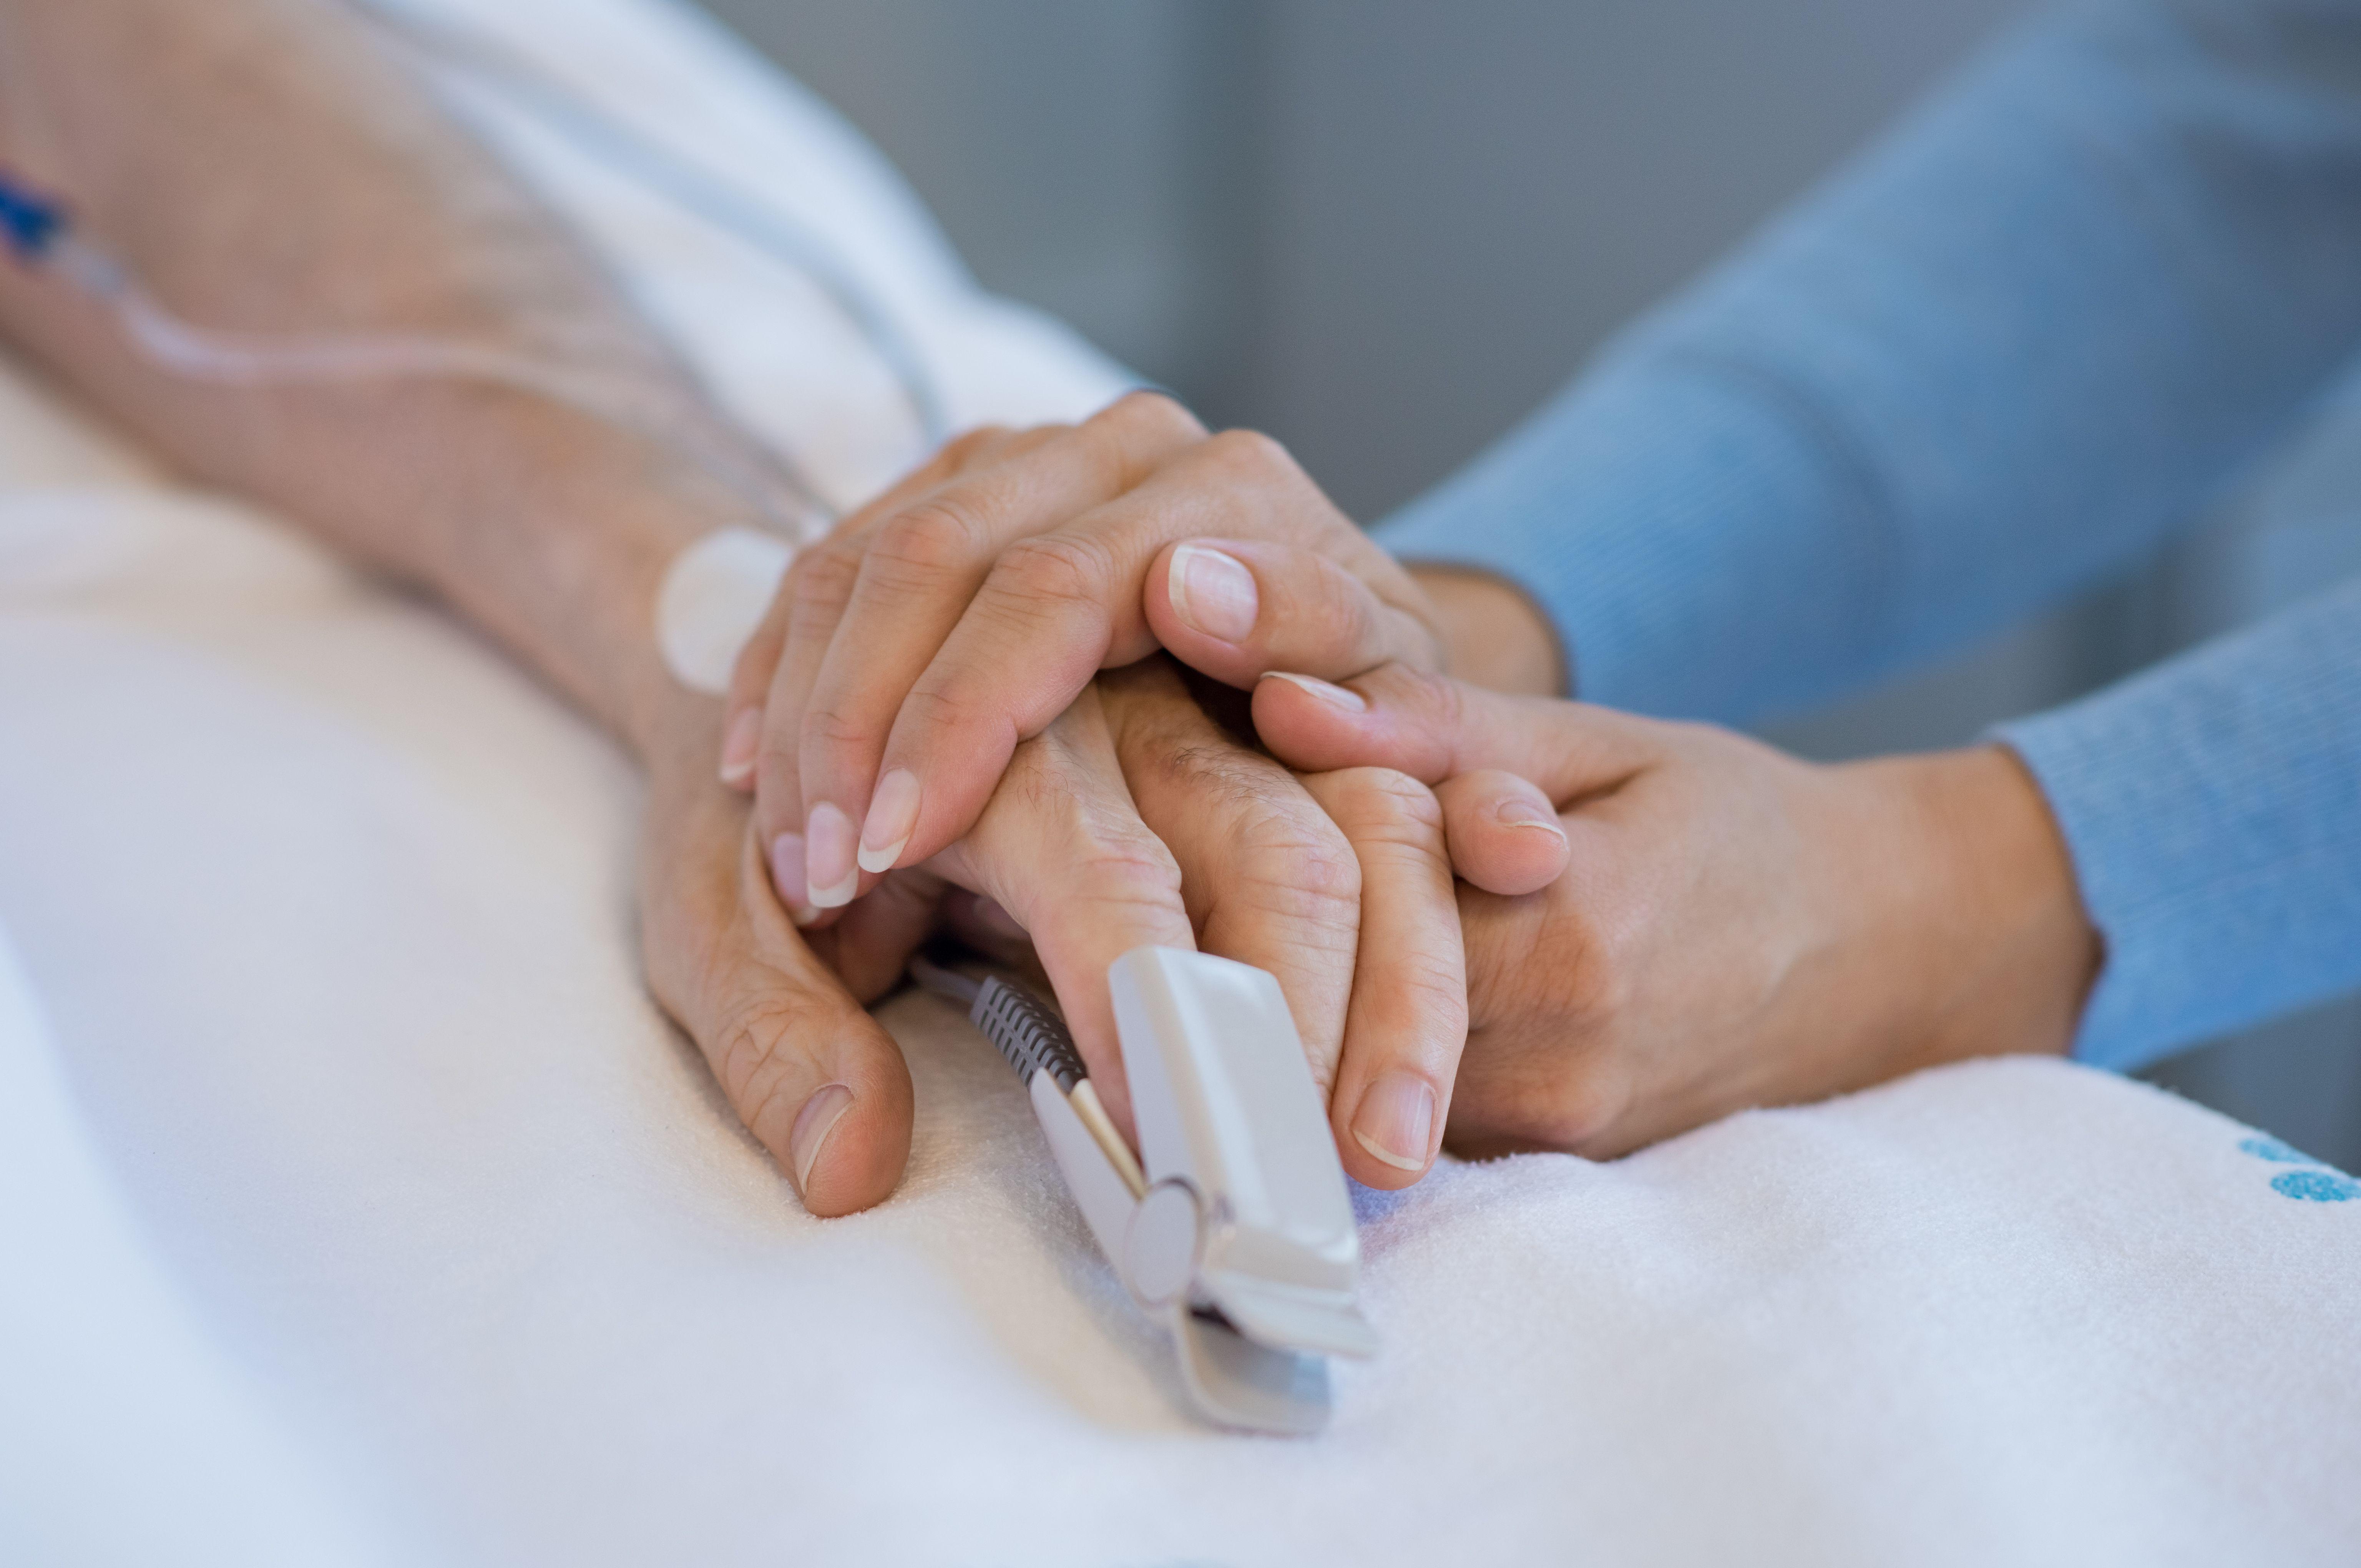 Asistencia Hospitalaria: Servicios de Alexia Asistencia